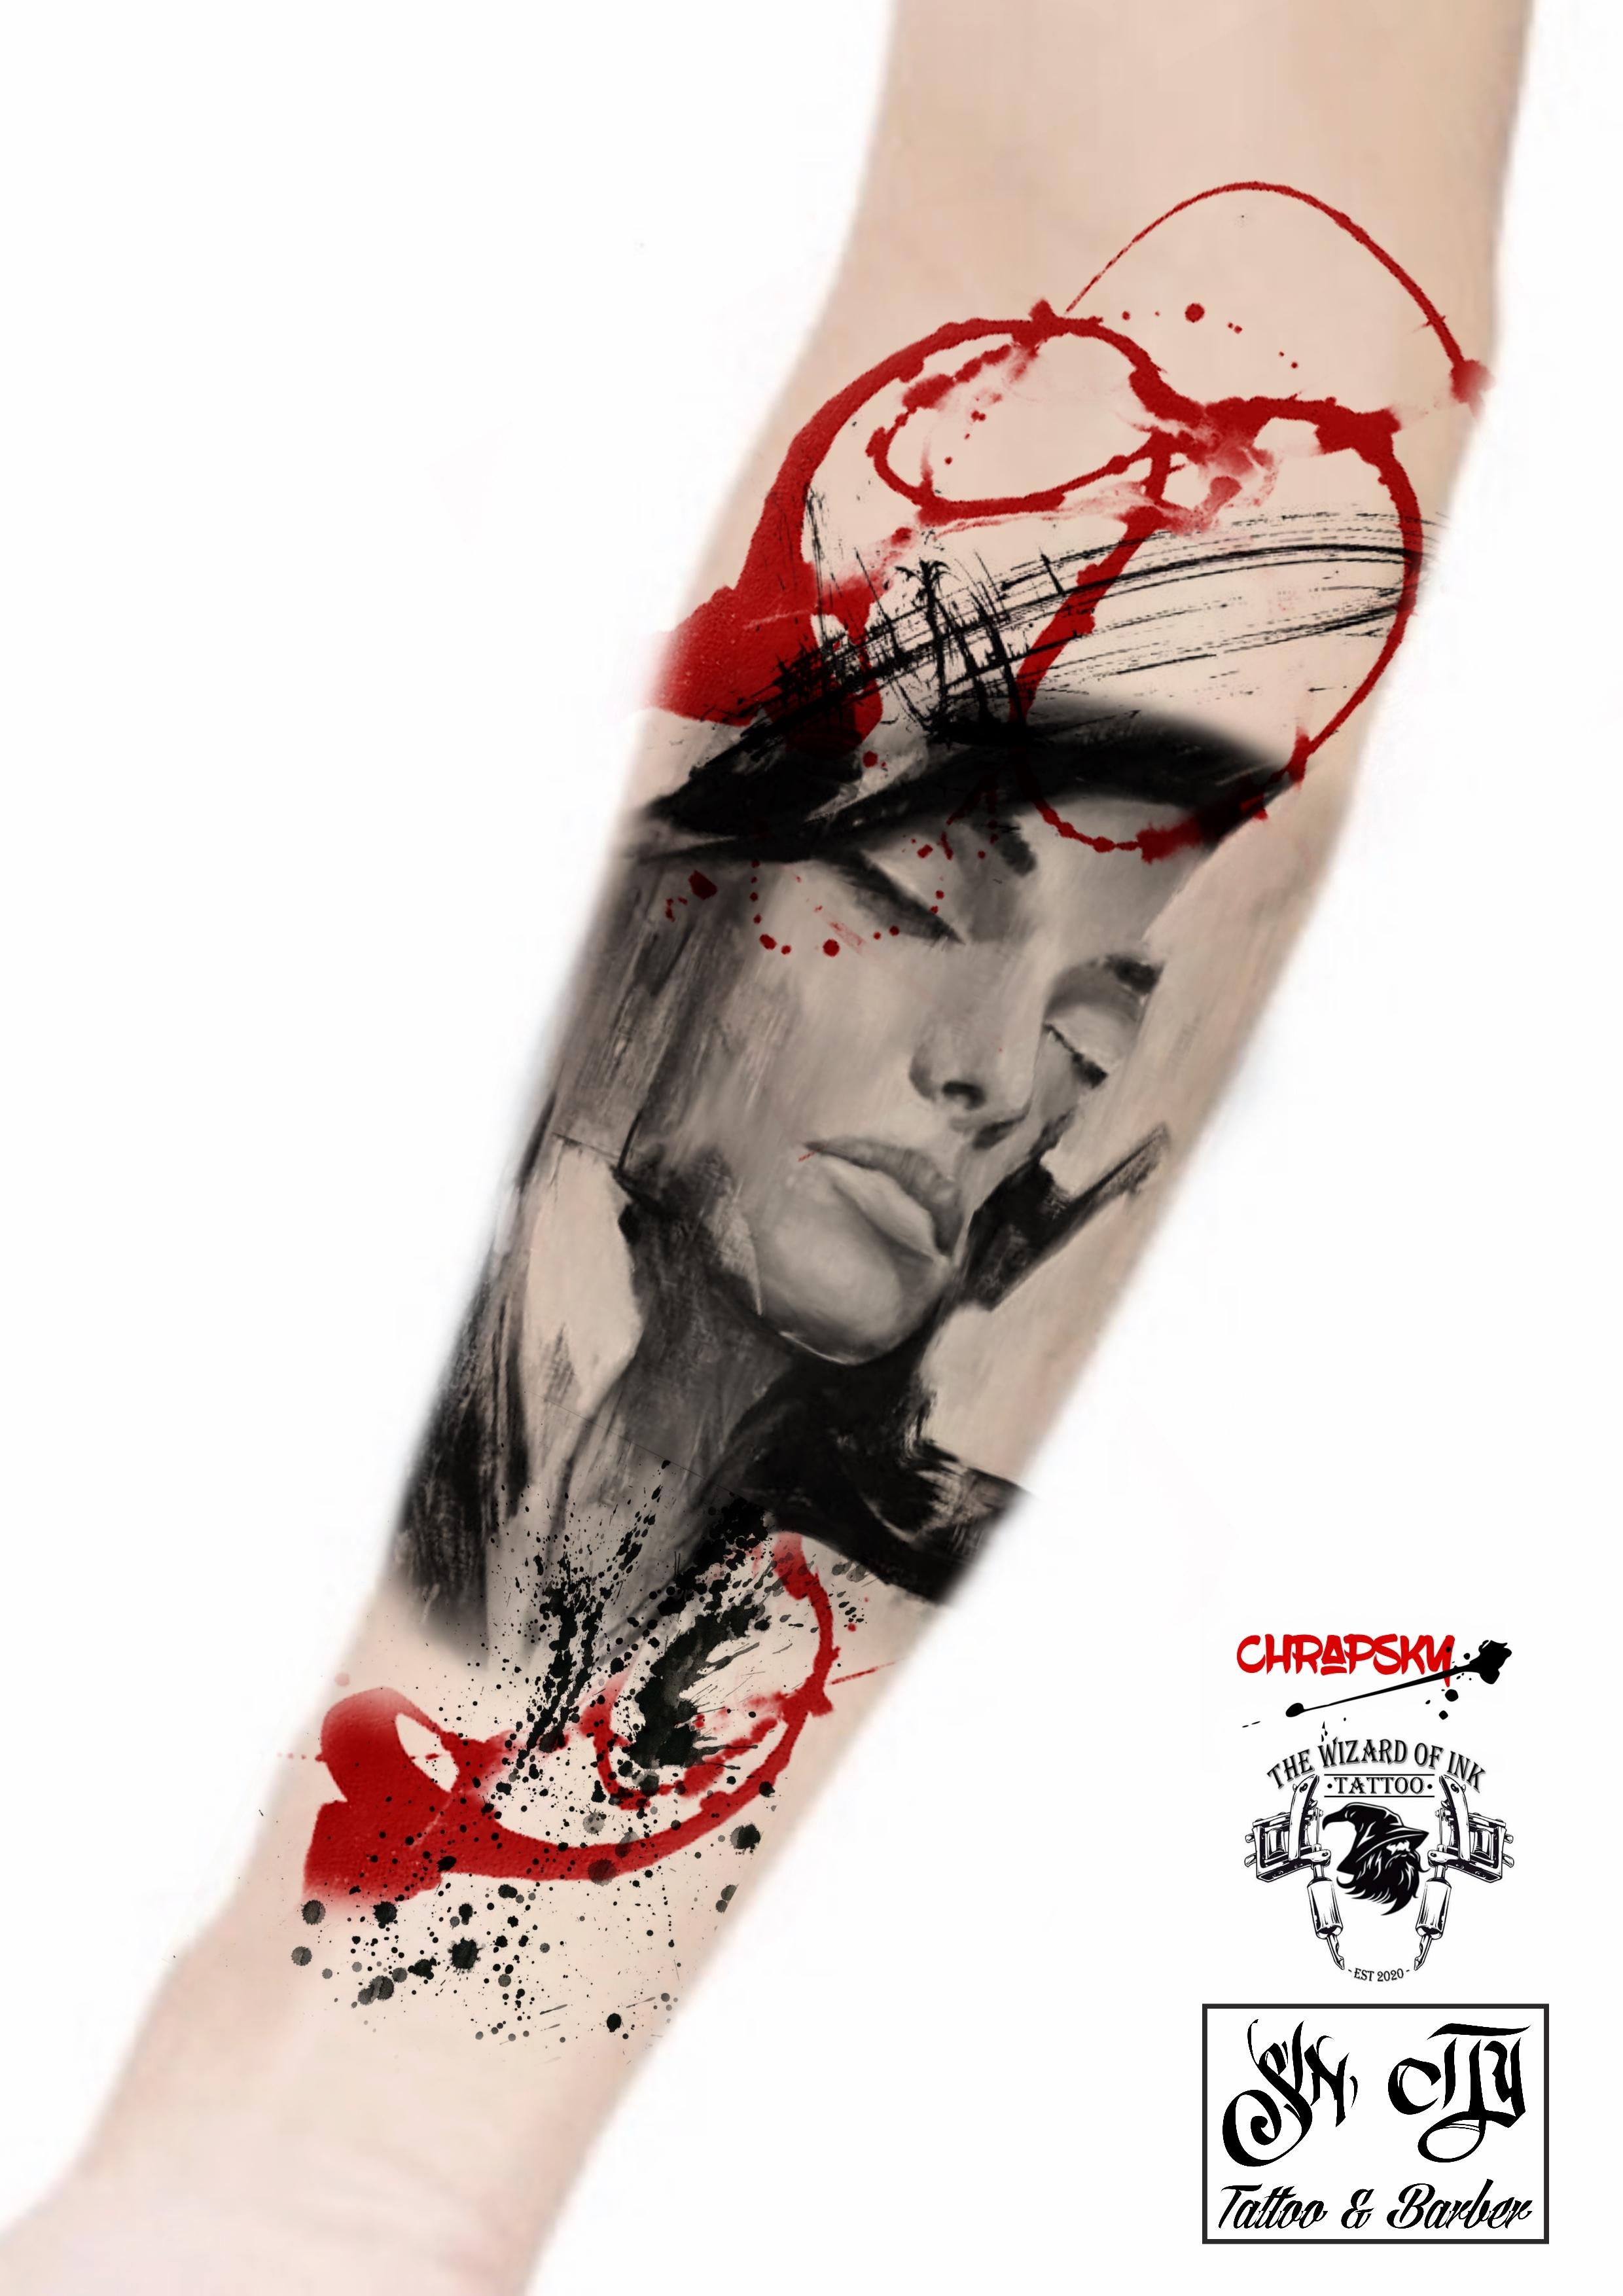 Inksearch tattoo Chrapsky